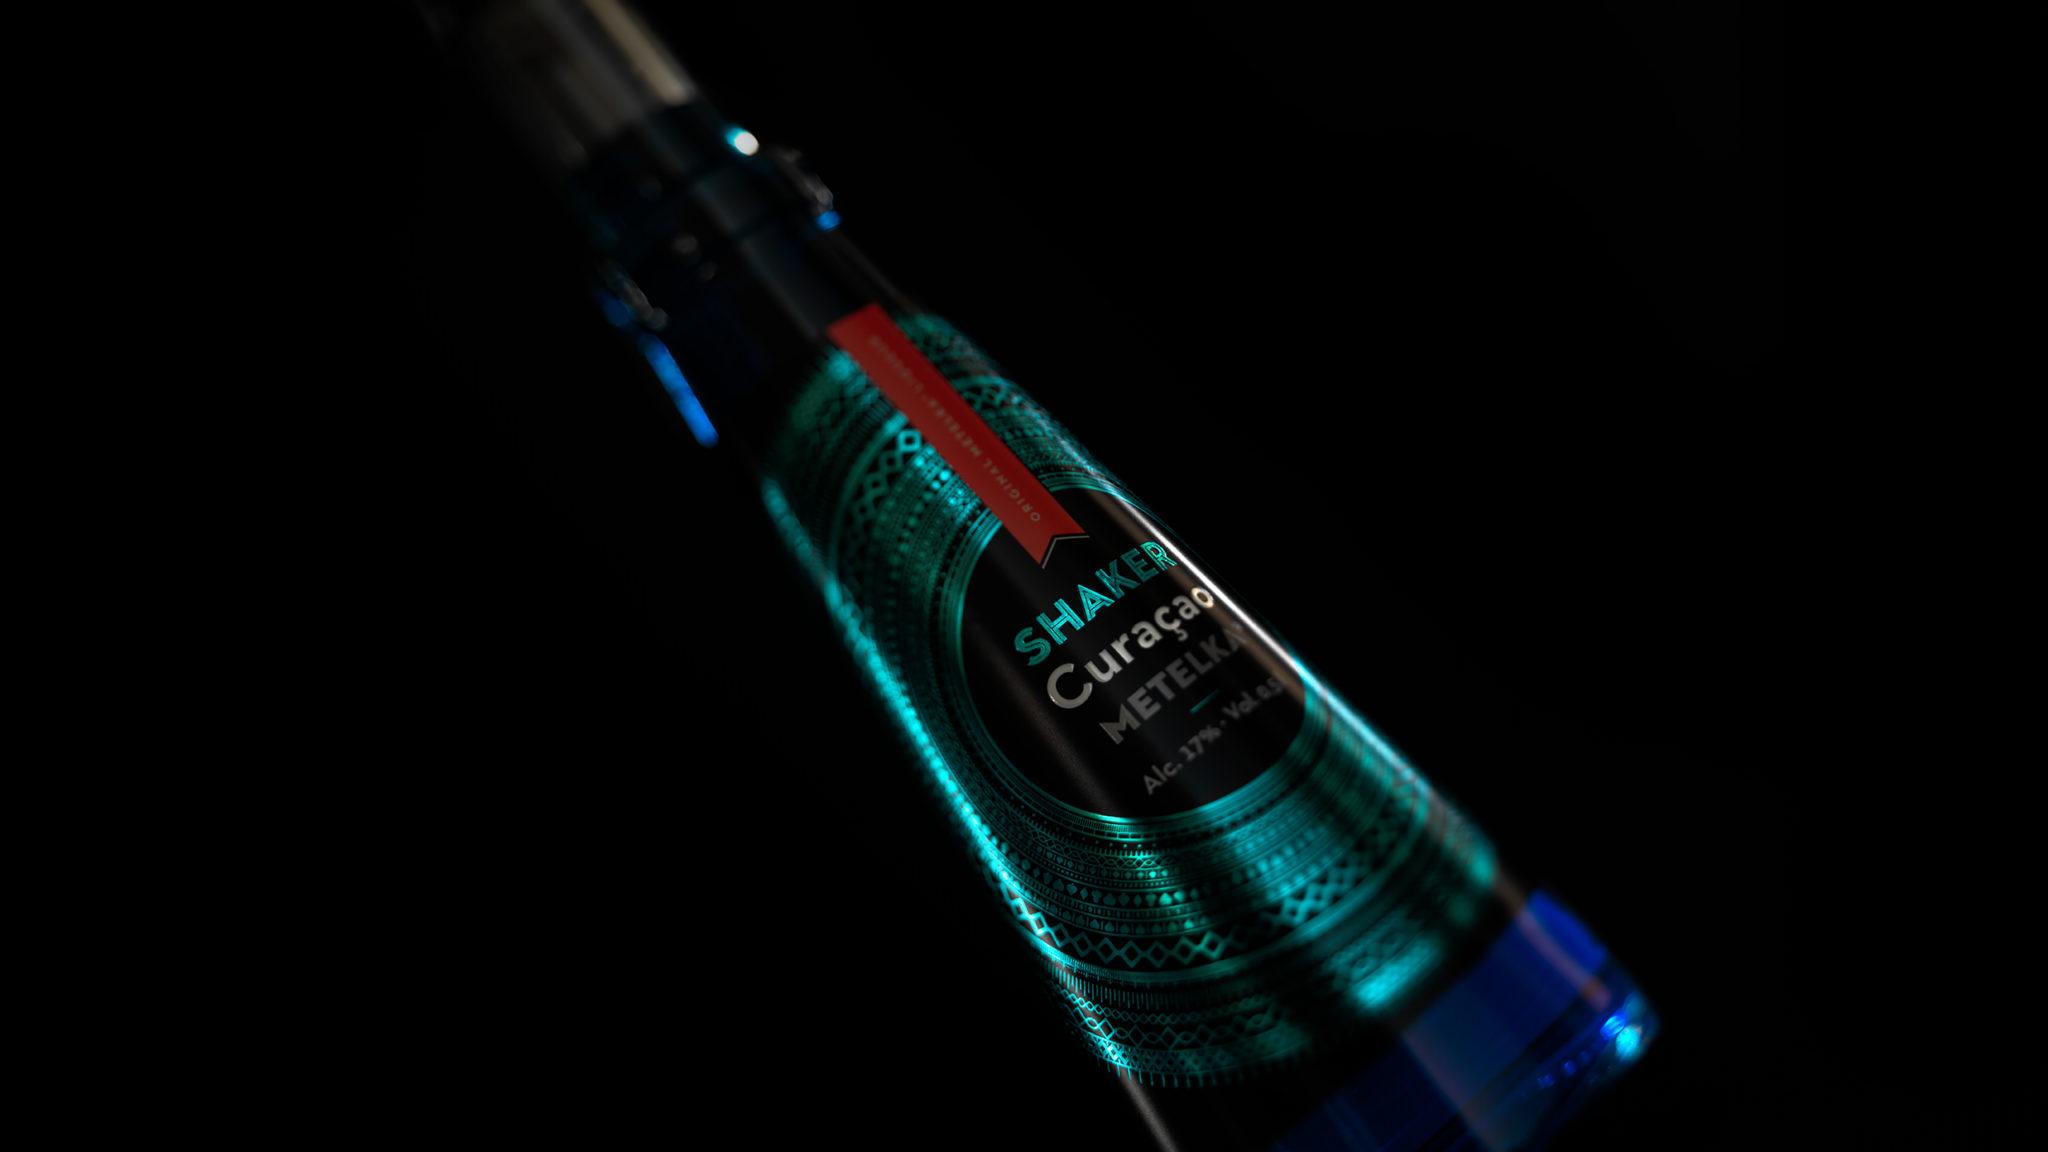 Pomerančový likér – Shaker Curacao 0,5 L